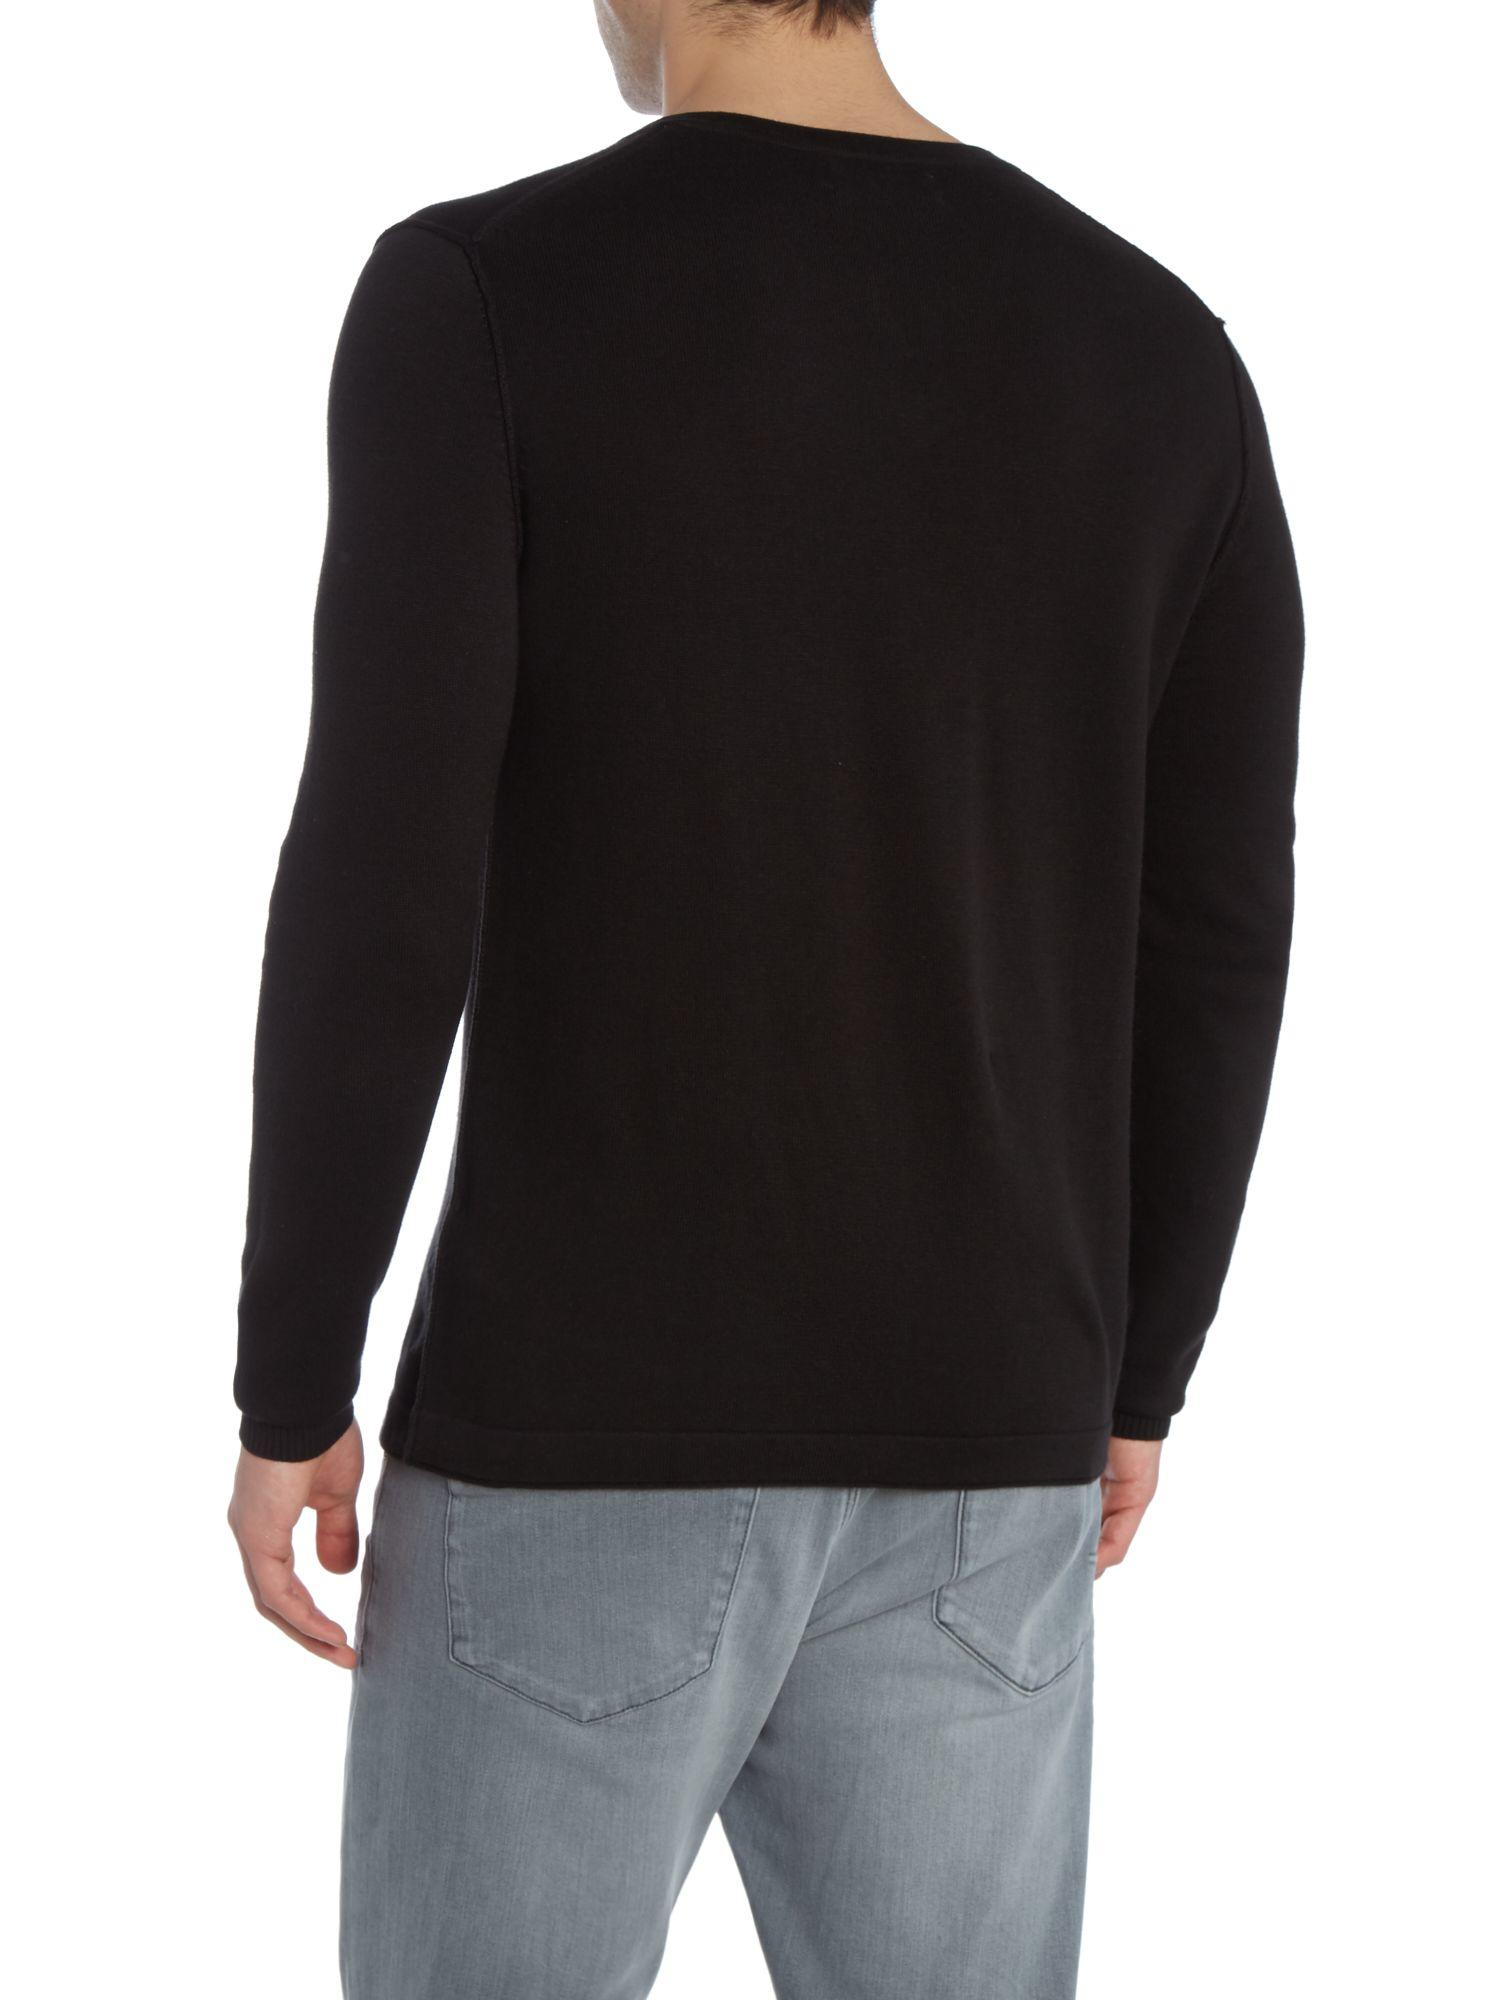 calvin klein codoc sweater in black for men lyst. Black Bedroom Furniture Sets. Home Design Ideas